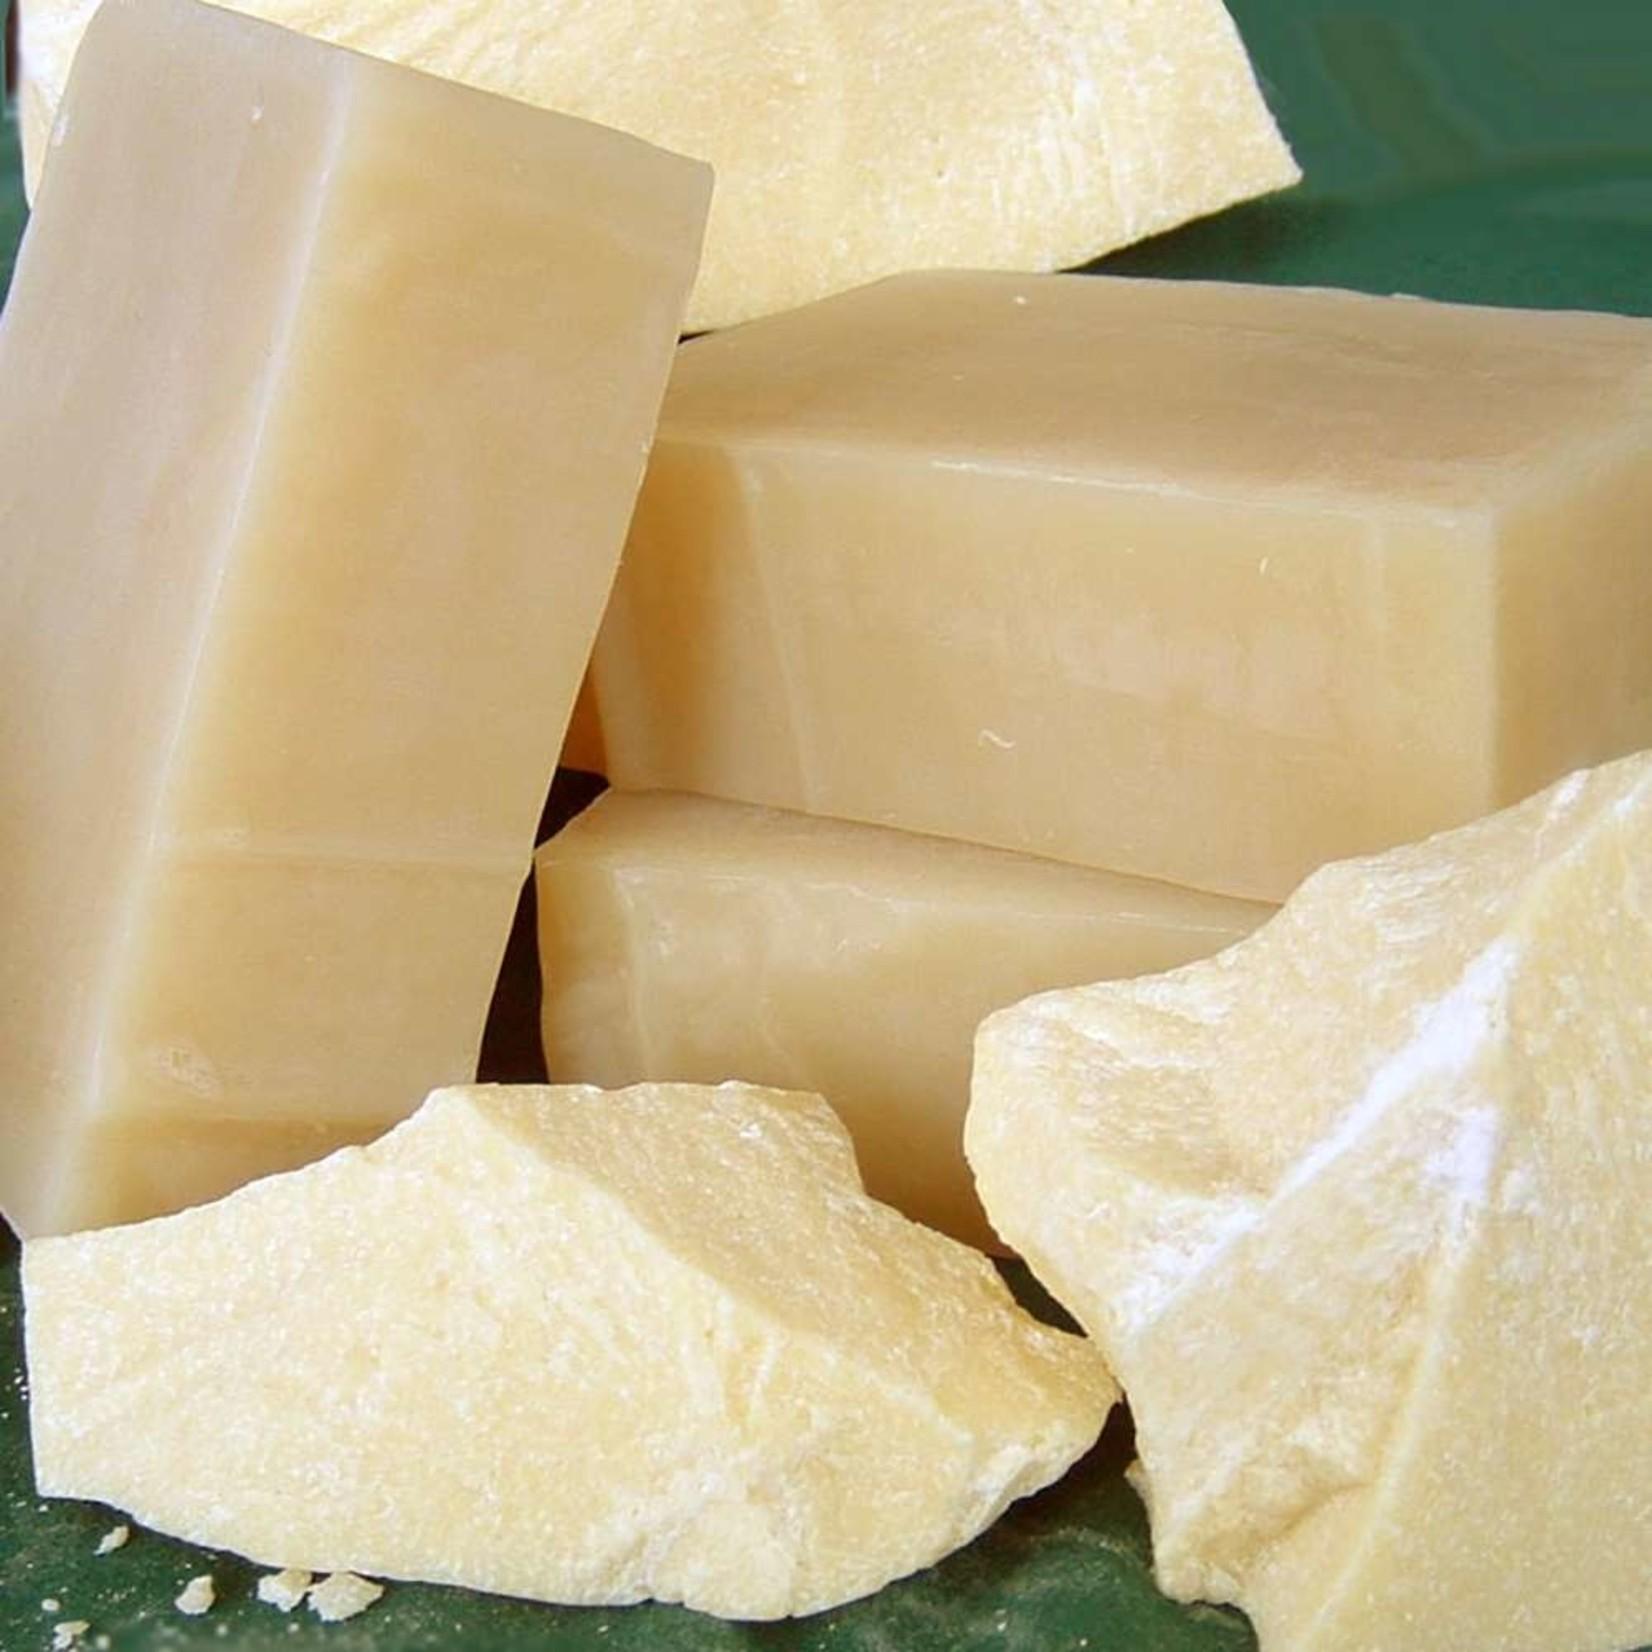 Chagrin Valley Soap and Salve Butter Bar Shampoo Bar 5.8oz